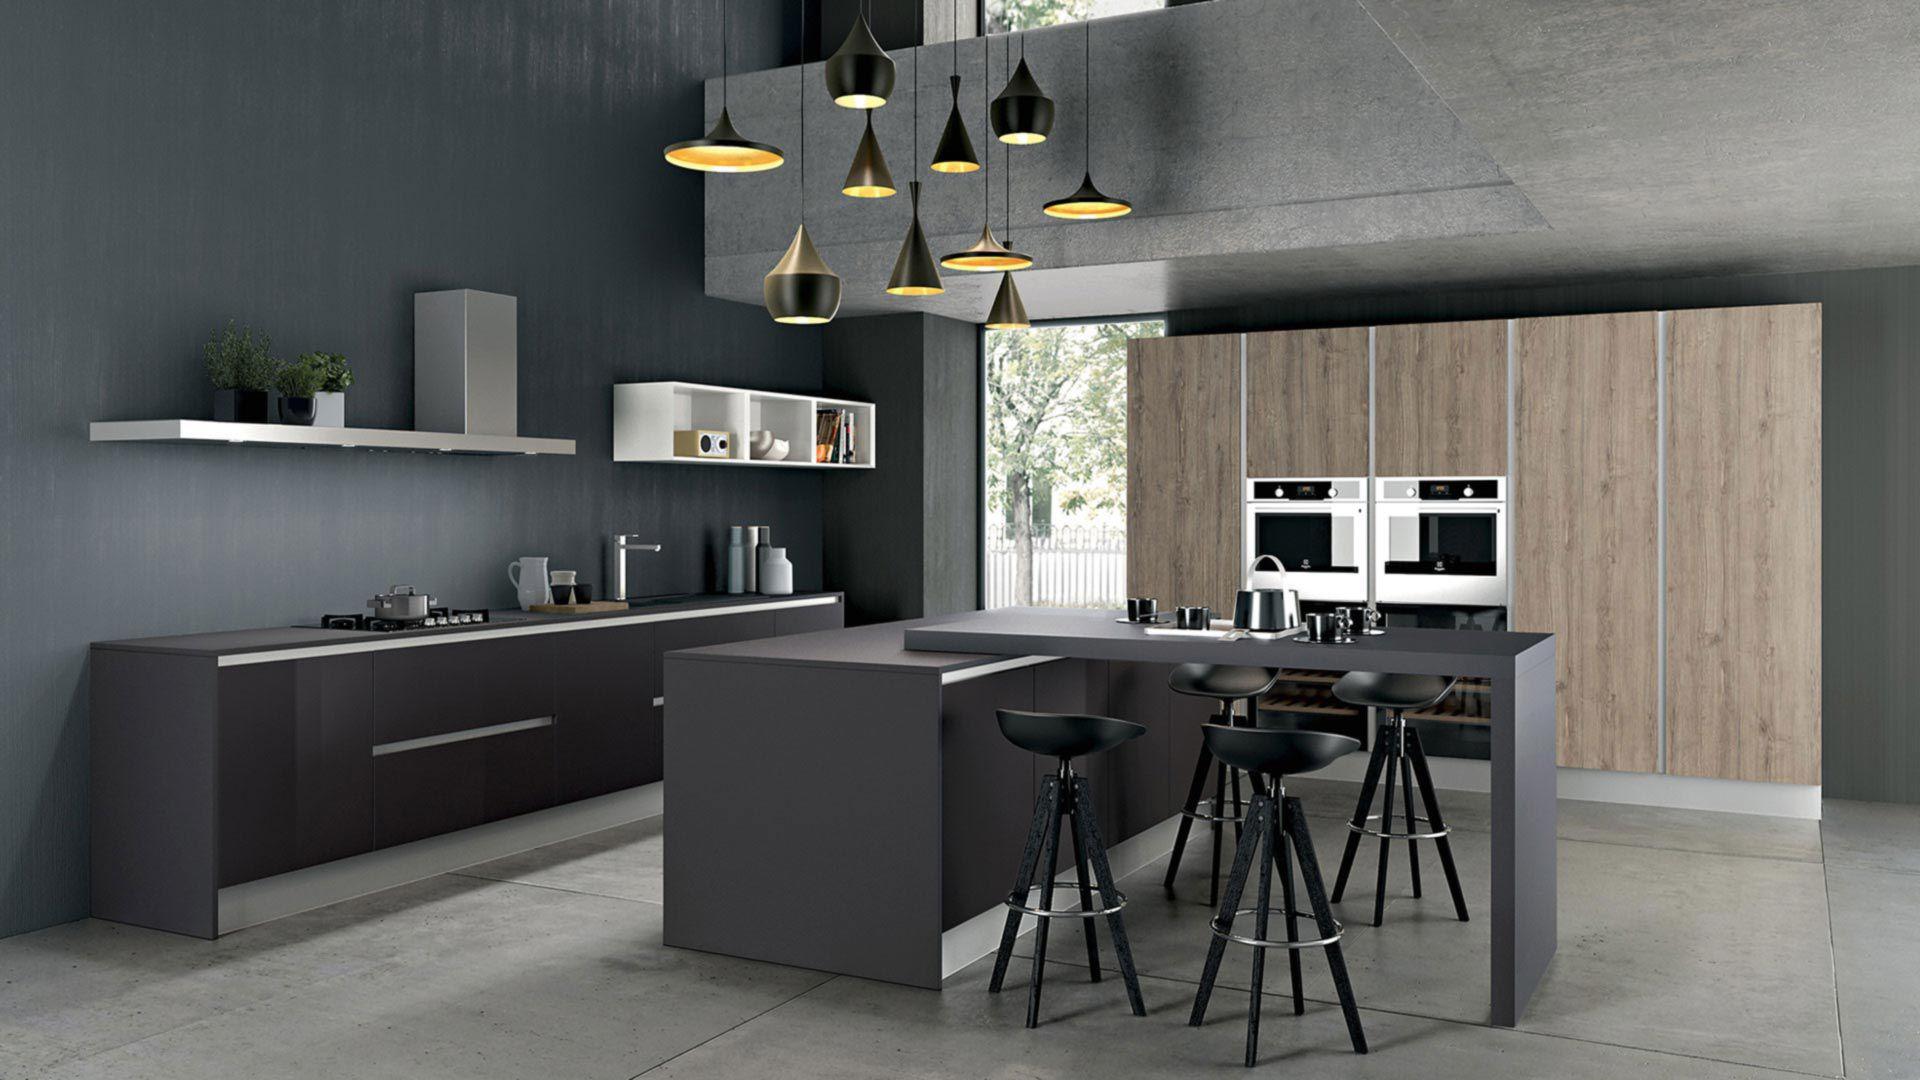 kitchen island with range broan hood 现代风格厨房 en stratifie 岛台式 烤漆 tau composition 01